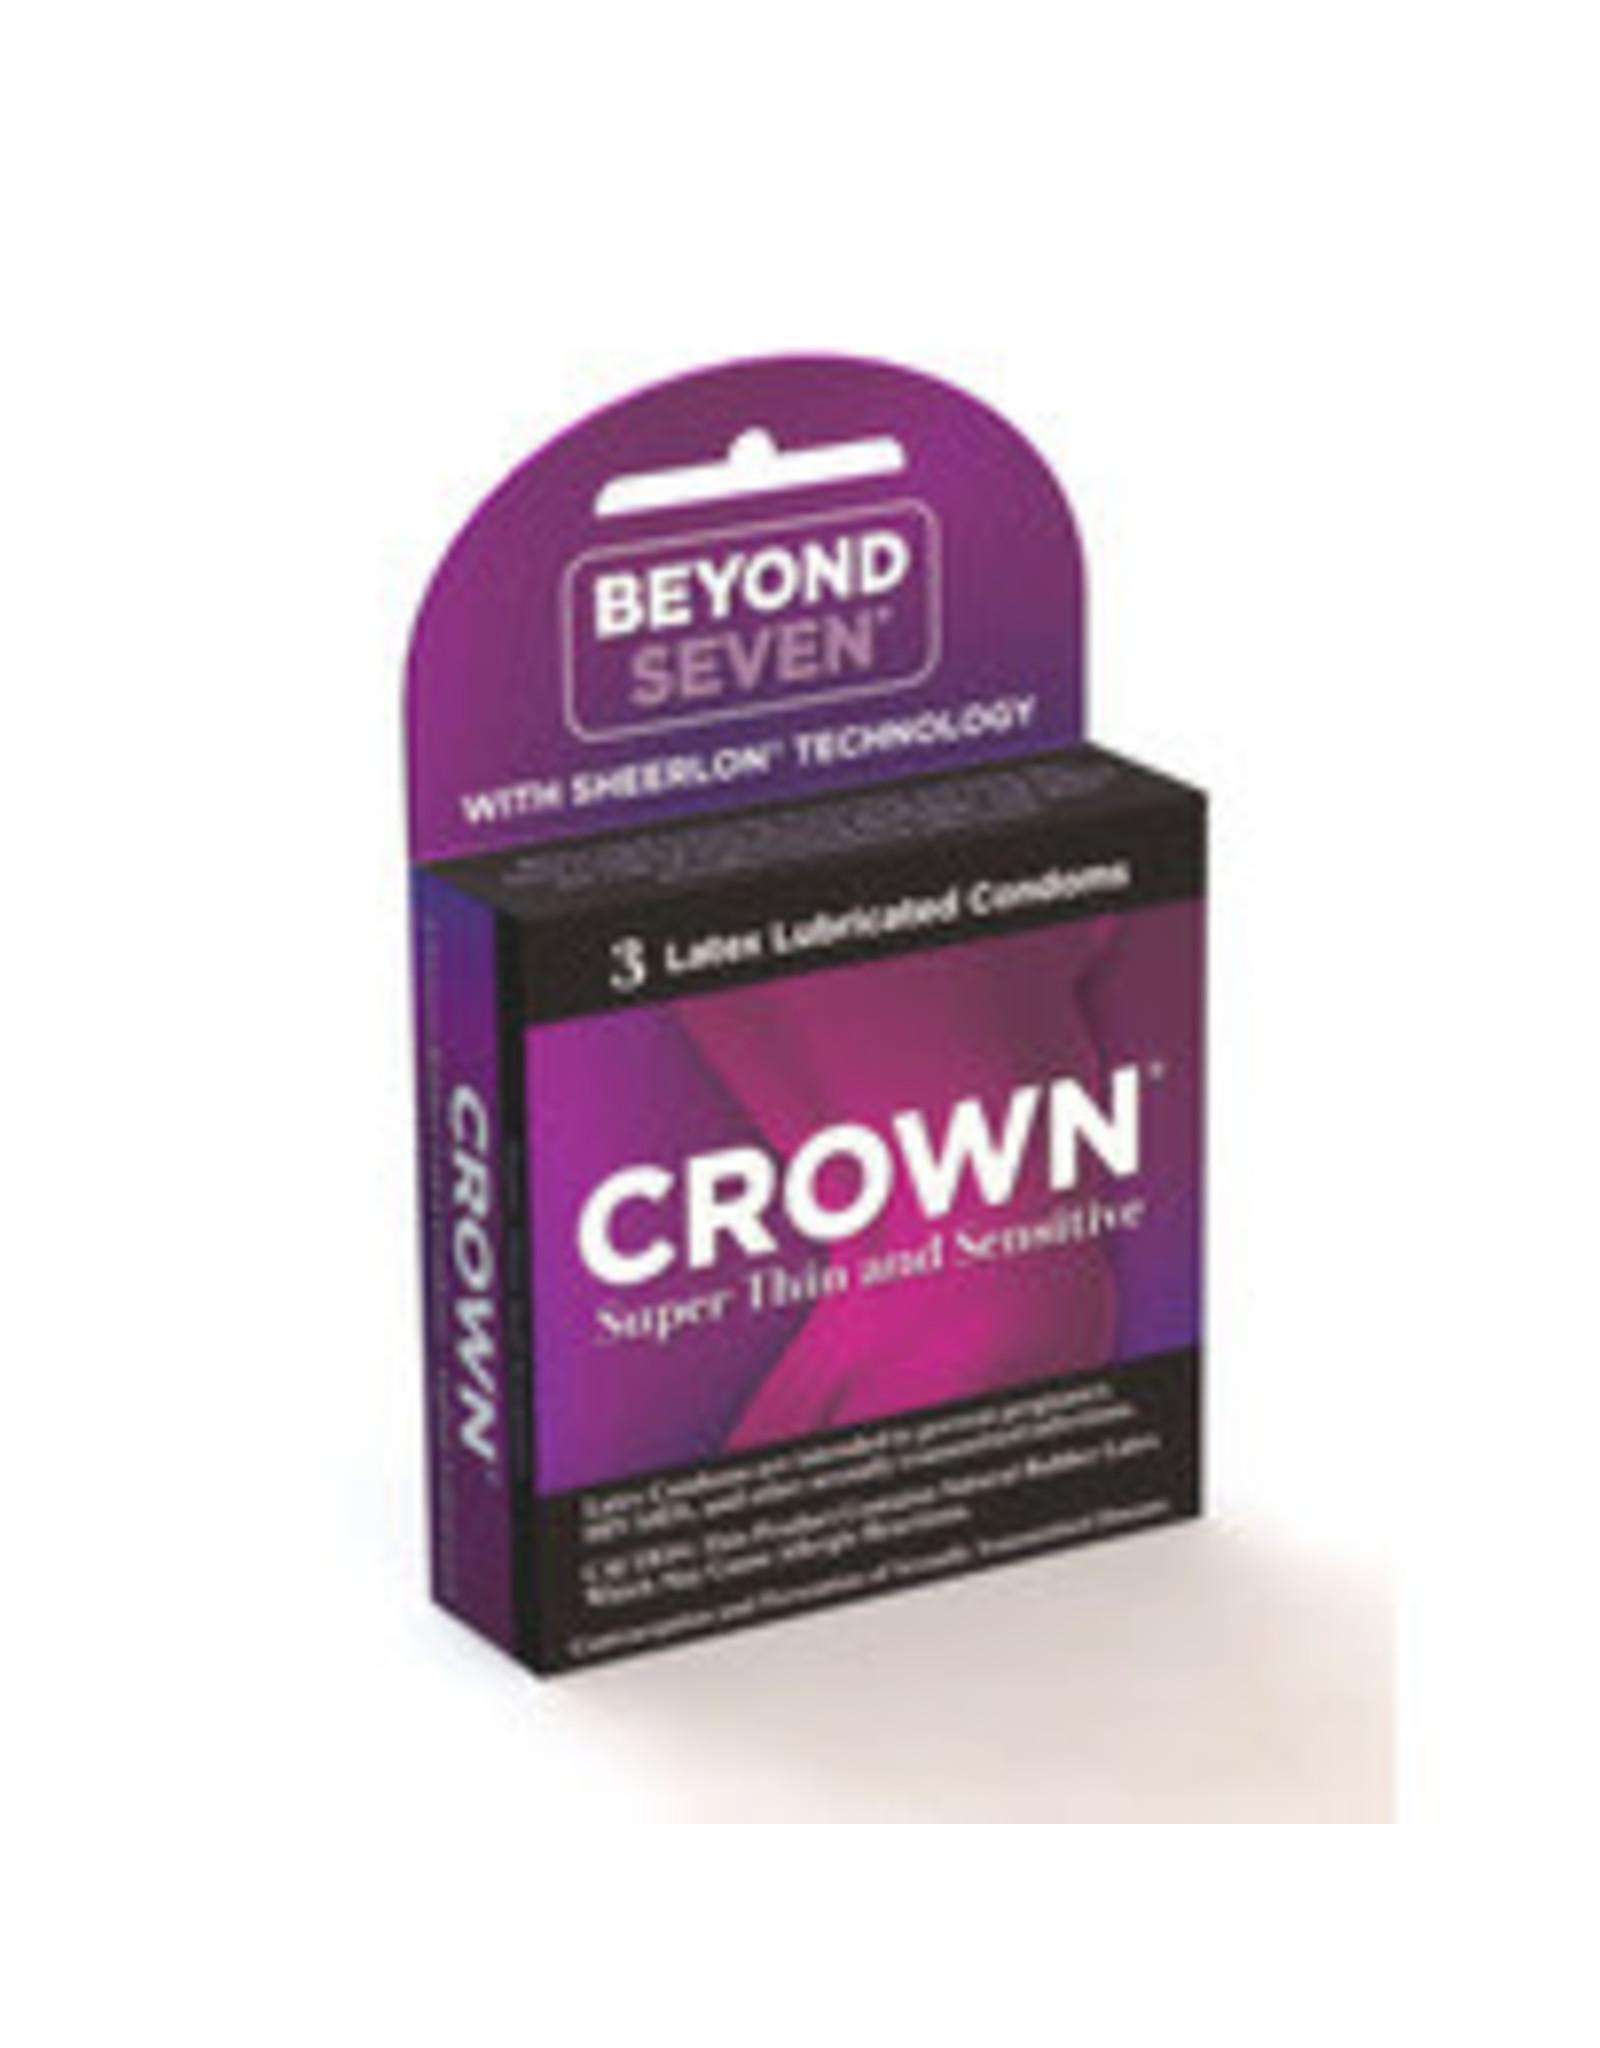 Crown Crown Condoms 3 pk